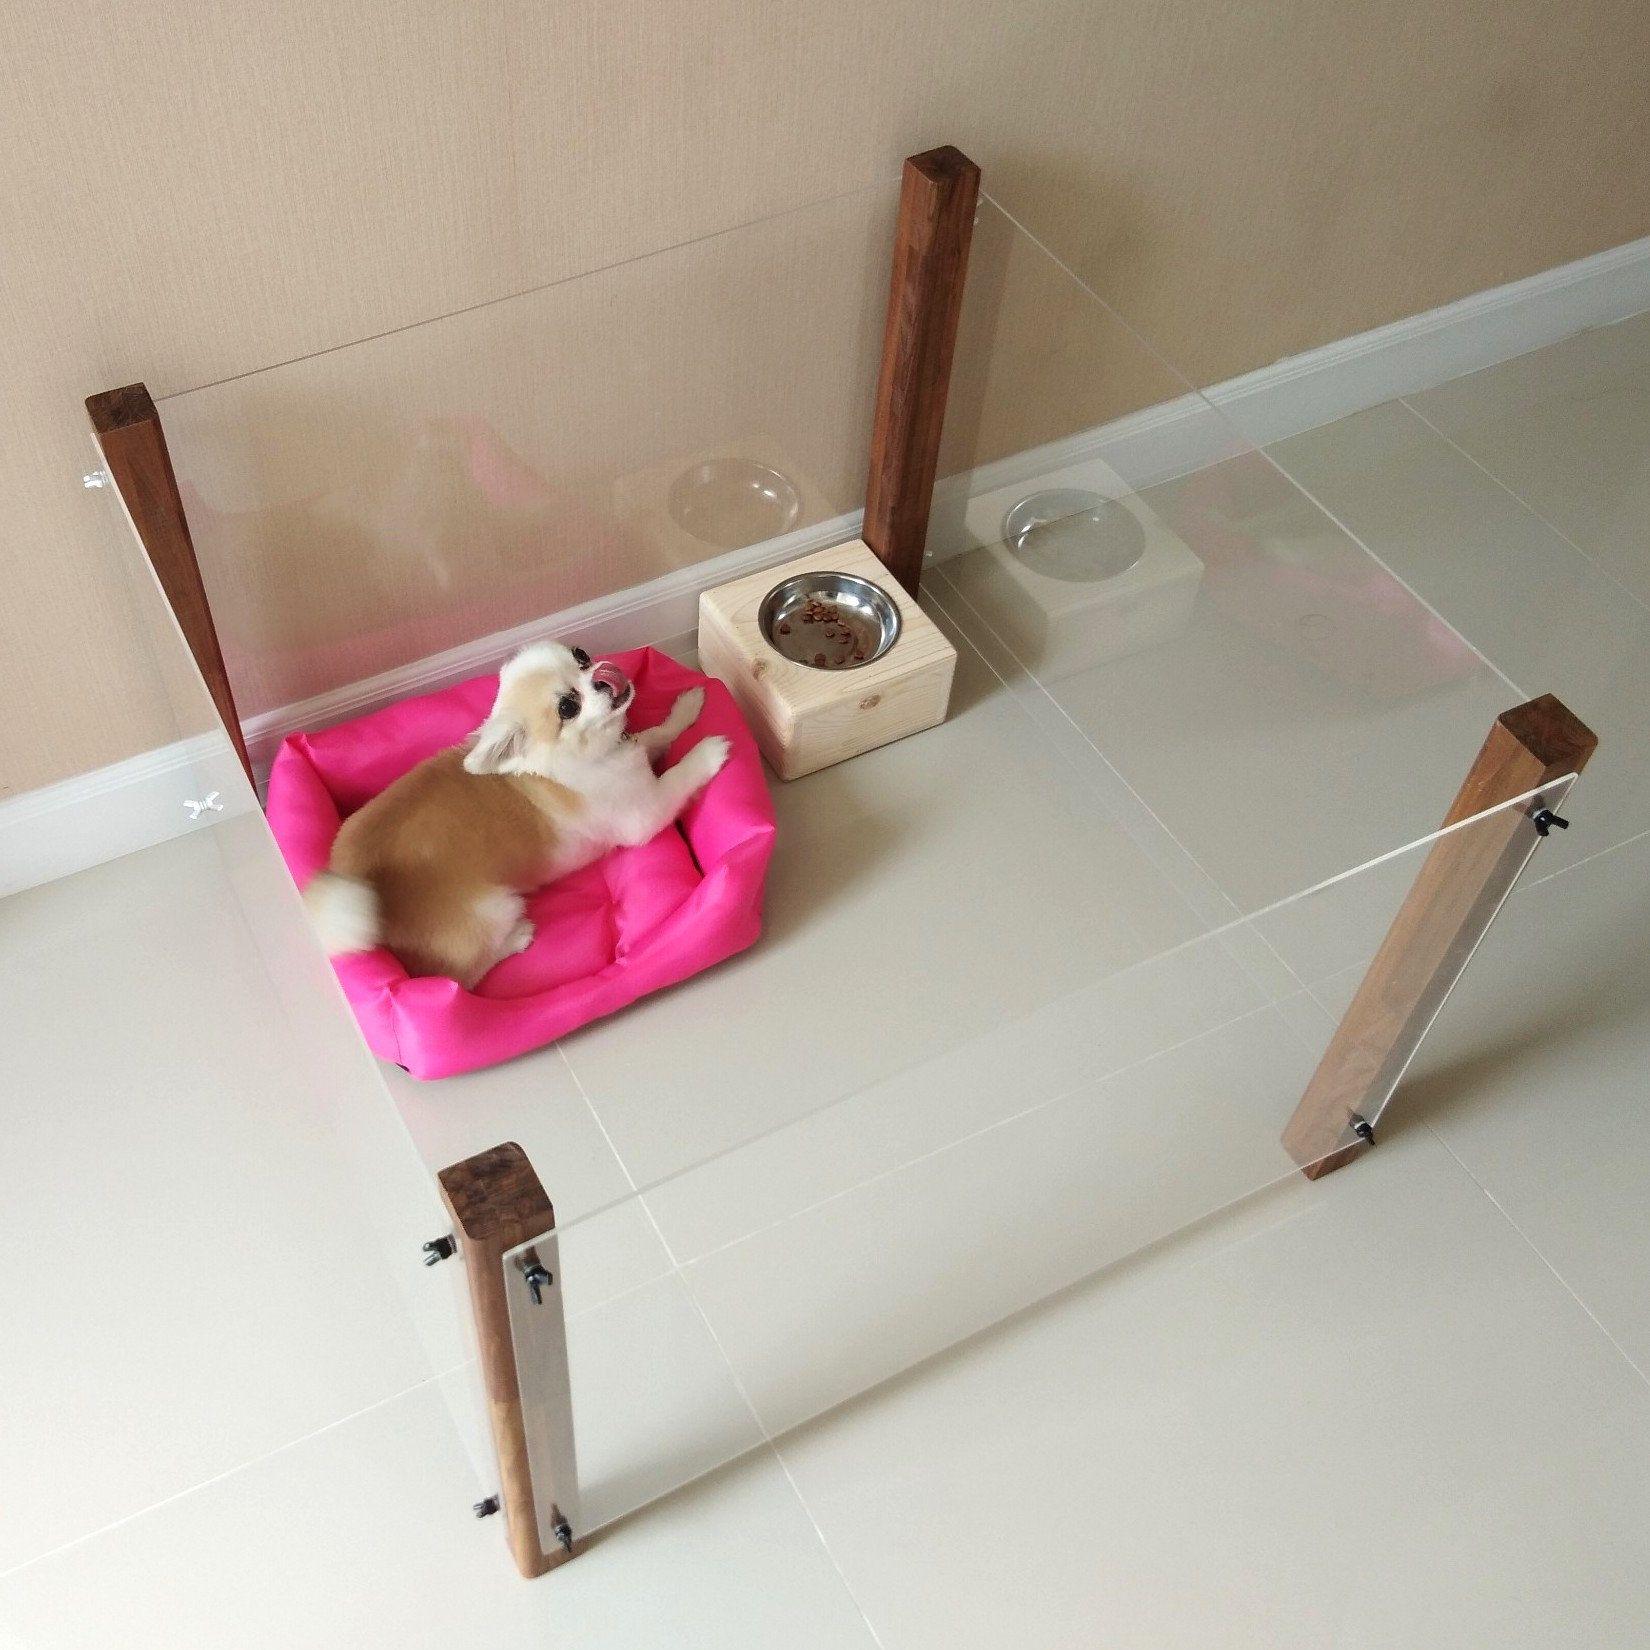 Dog Pet Create Kennel Furniture Indoor Teak Wood By Foxtalesth On Etsy Dog Crate Furniture Dog Crate Crates